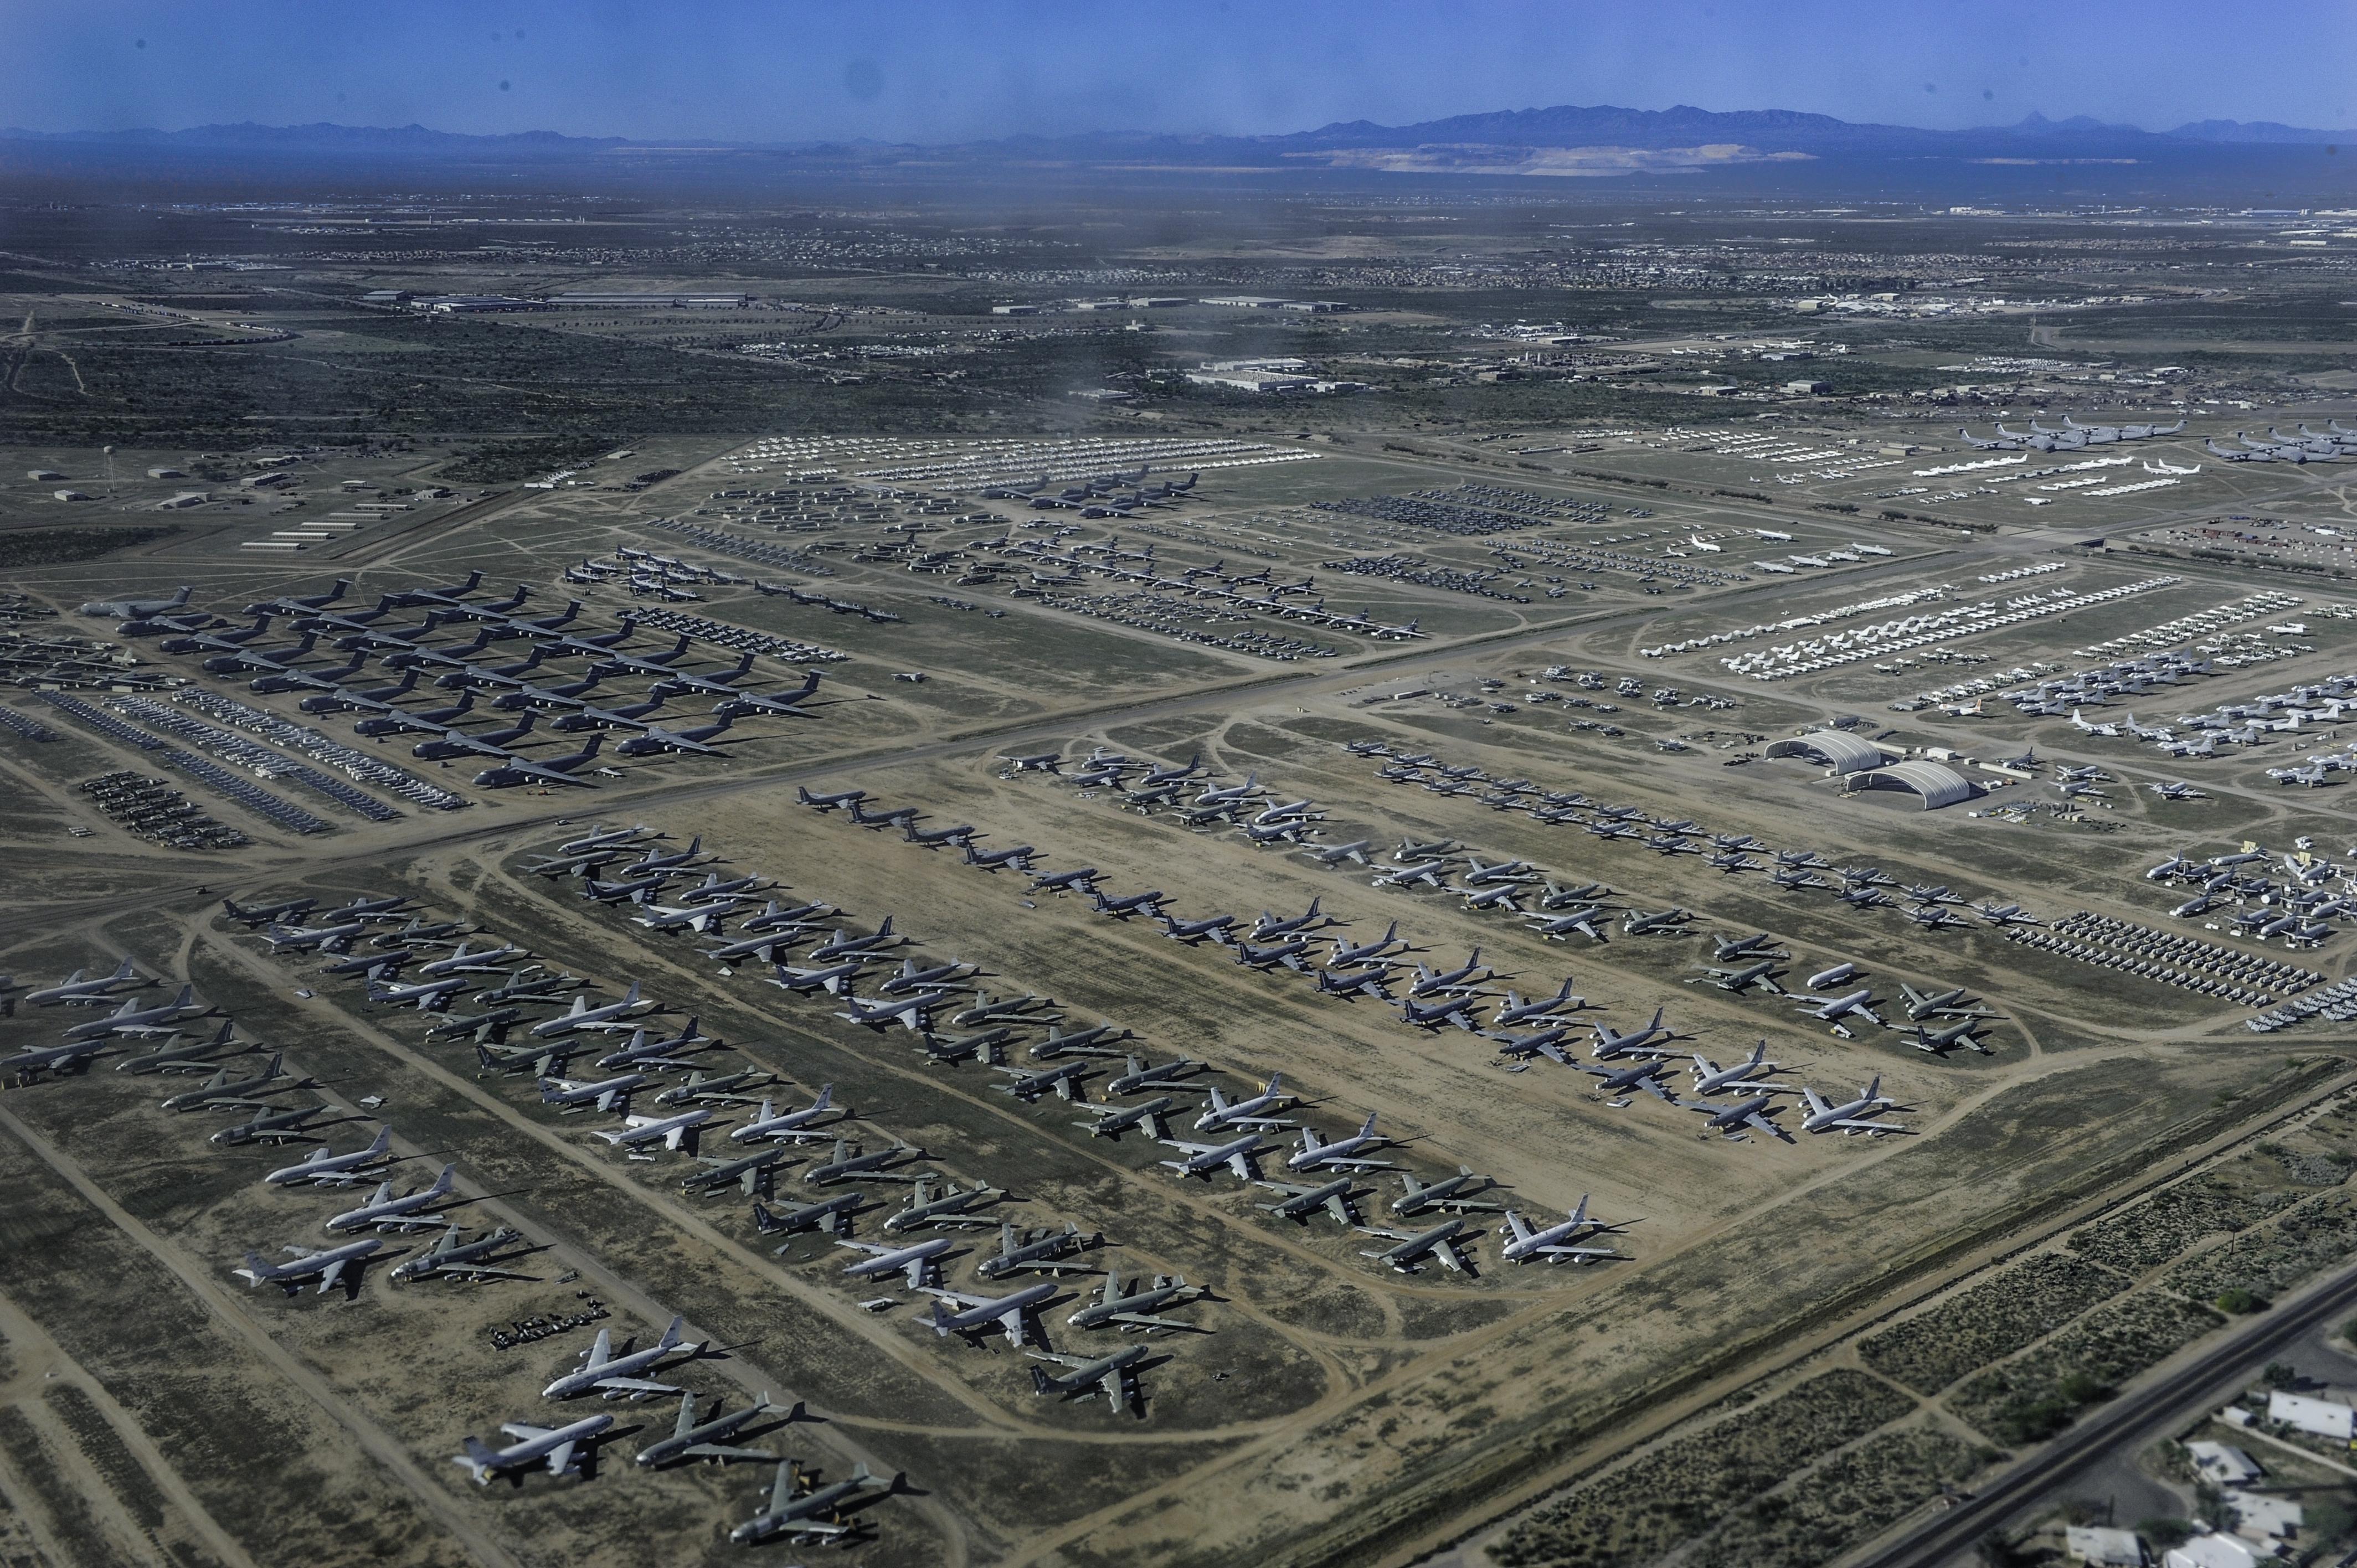 Davis Monthan Air Force Base, USA, Sky view, Aerial views